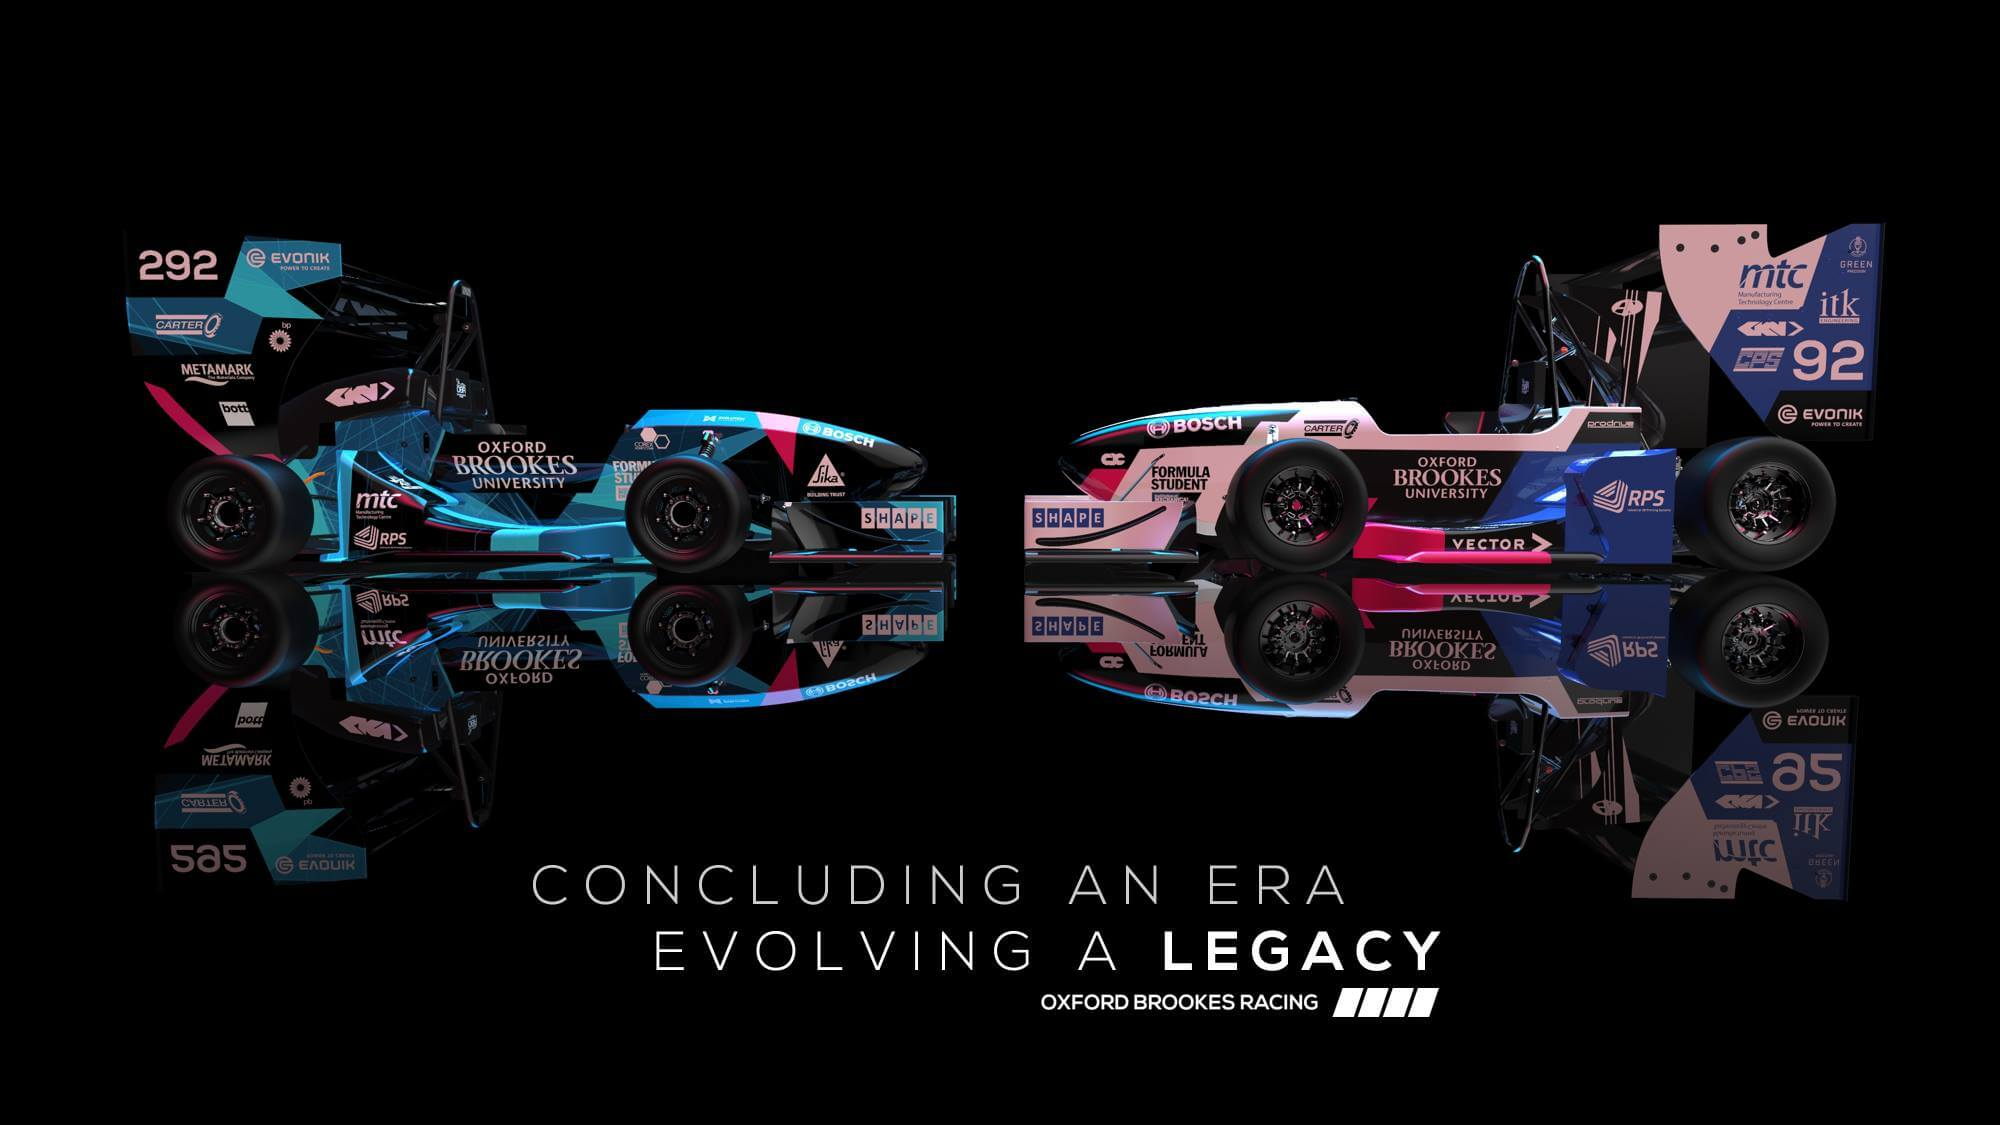 OBR 2019 cars